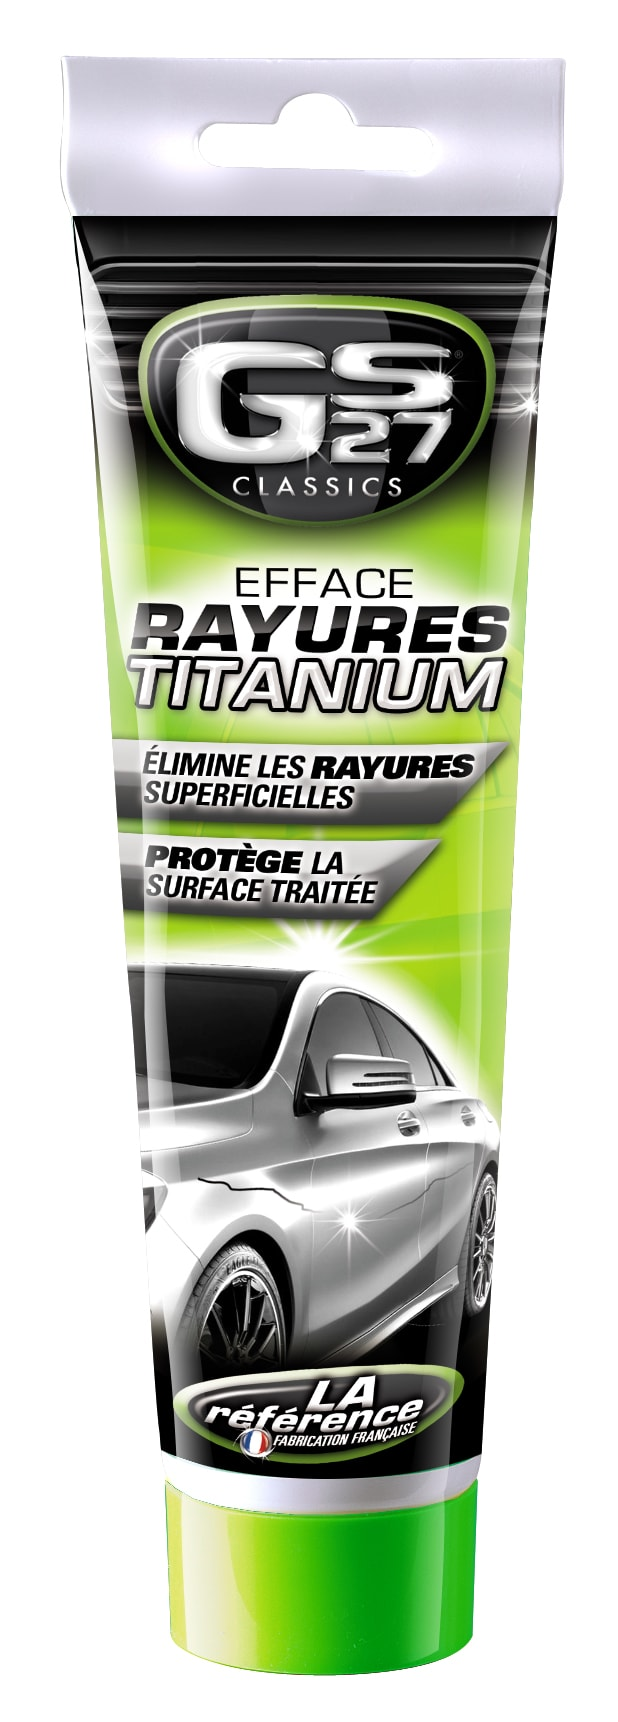 Efface Rayures Titanium